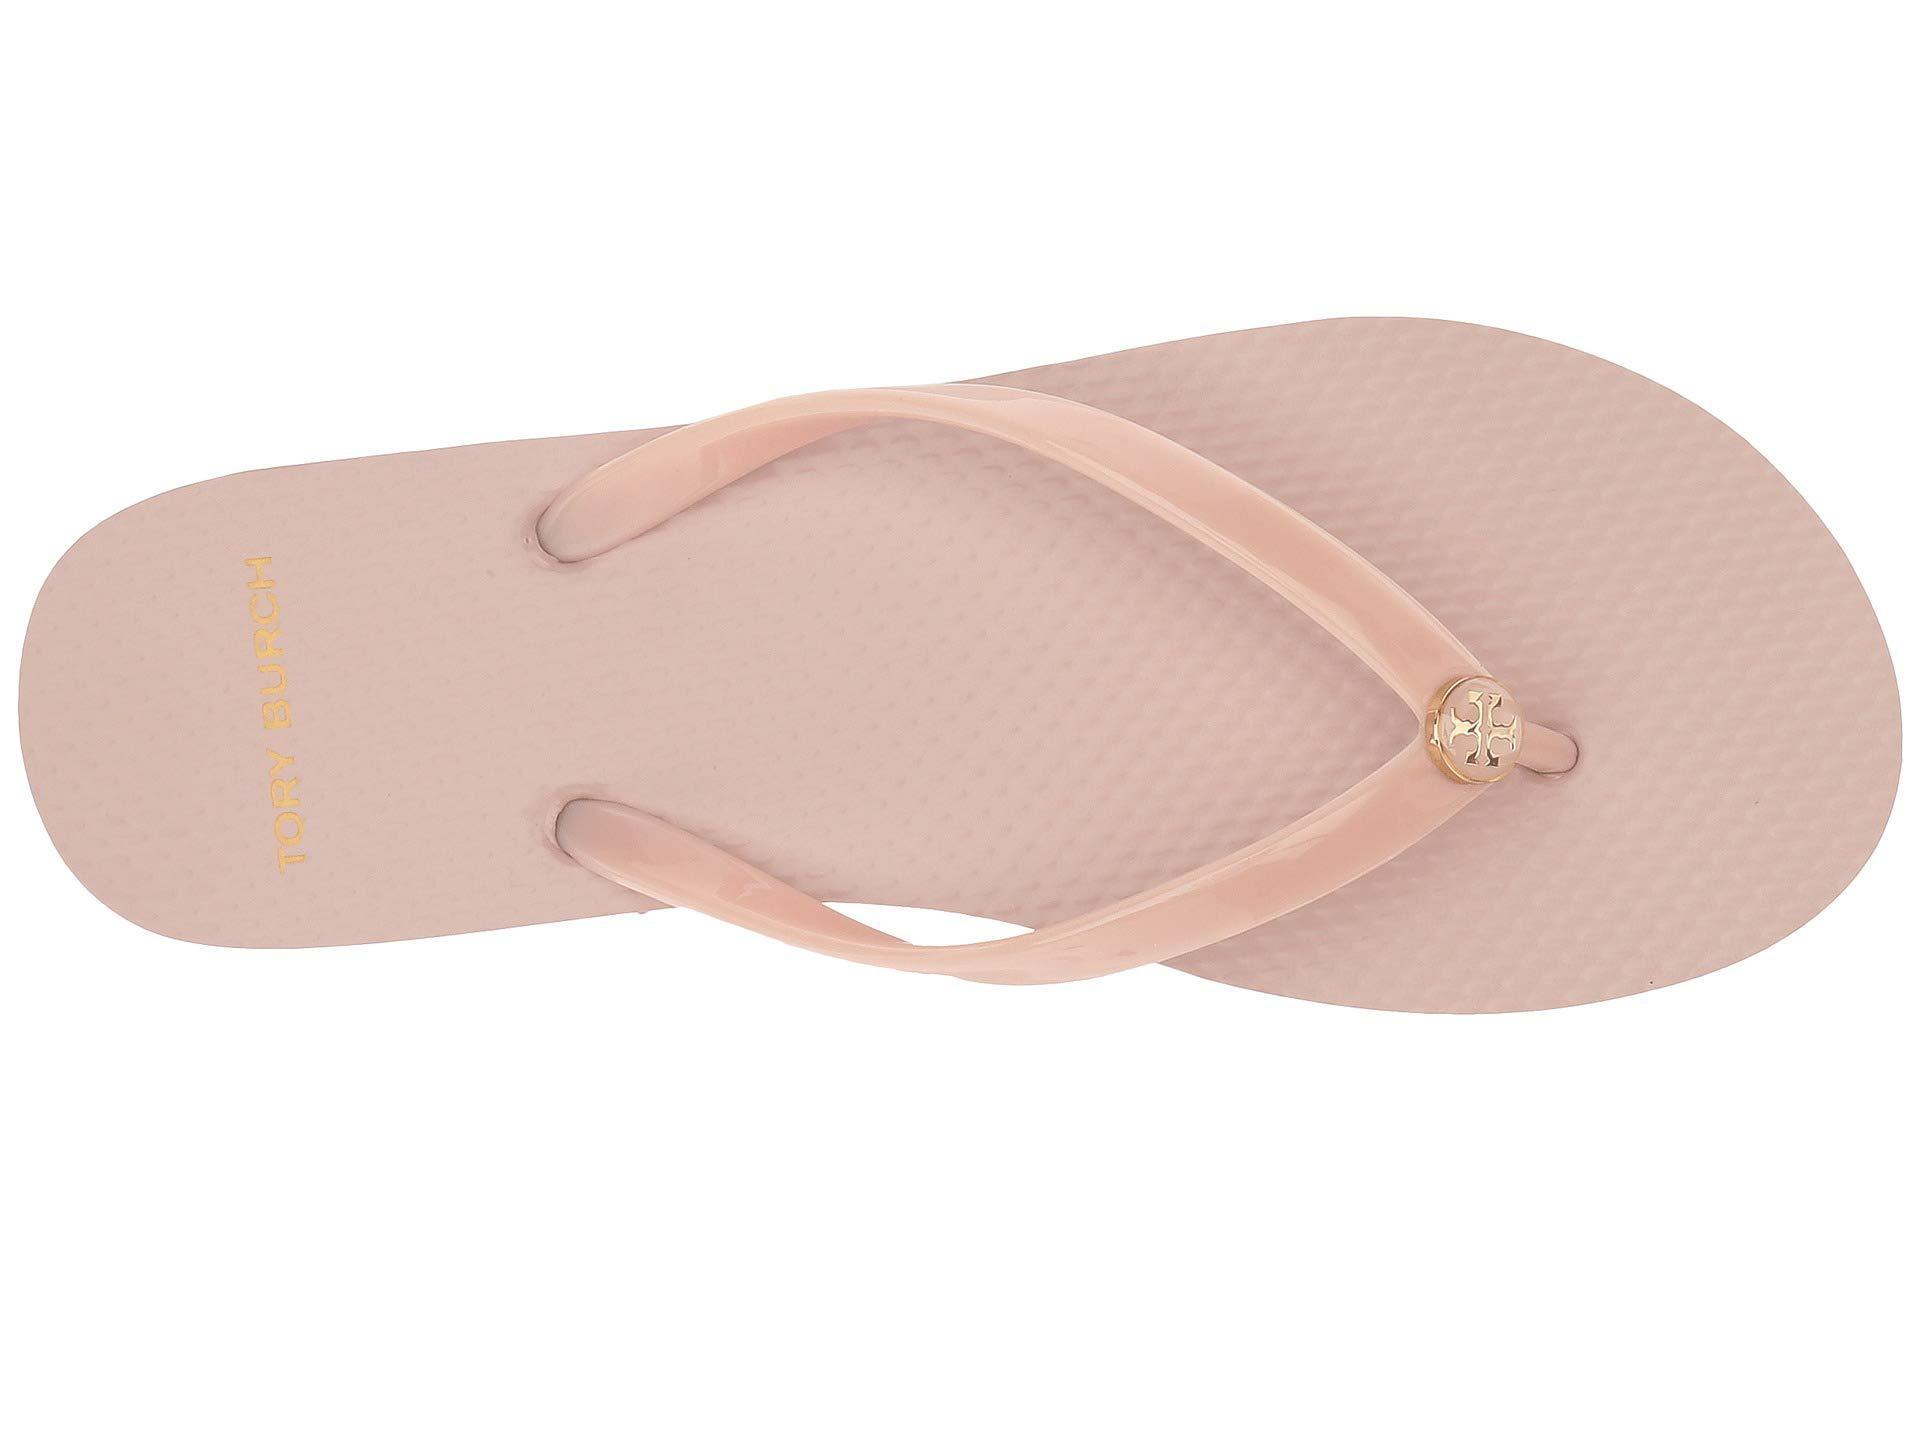 e95c1a1b5a76c6 Tory Burch - Pink Thin Flip Flop (brilliant Red) Women s Sandals - Lyst.  View fullscreen